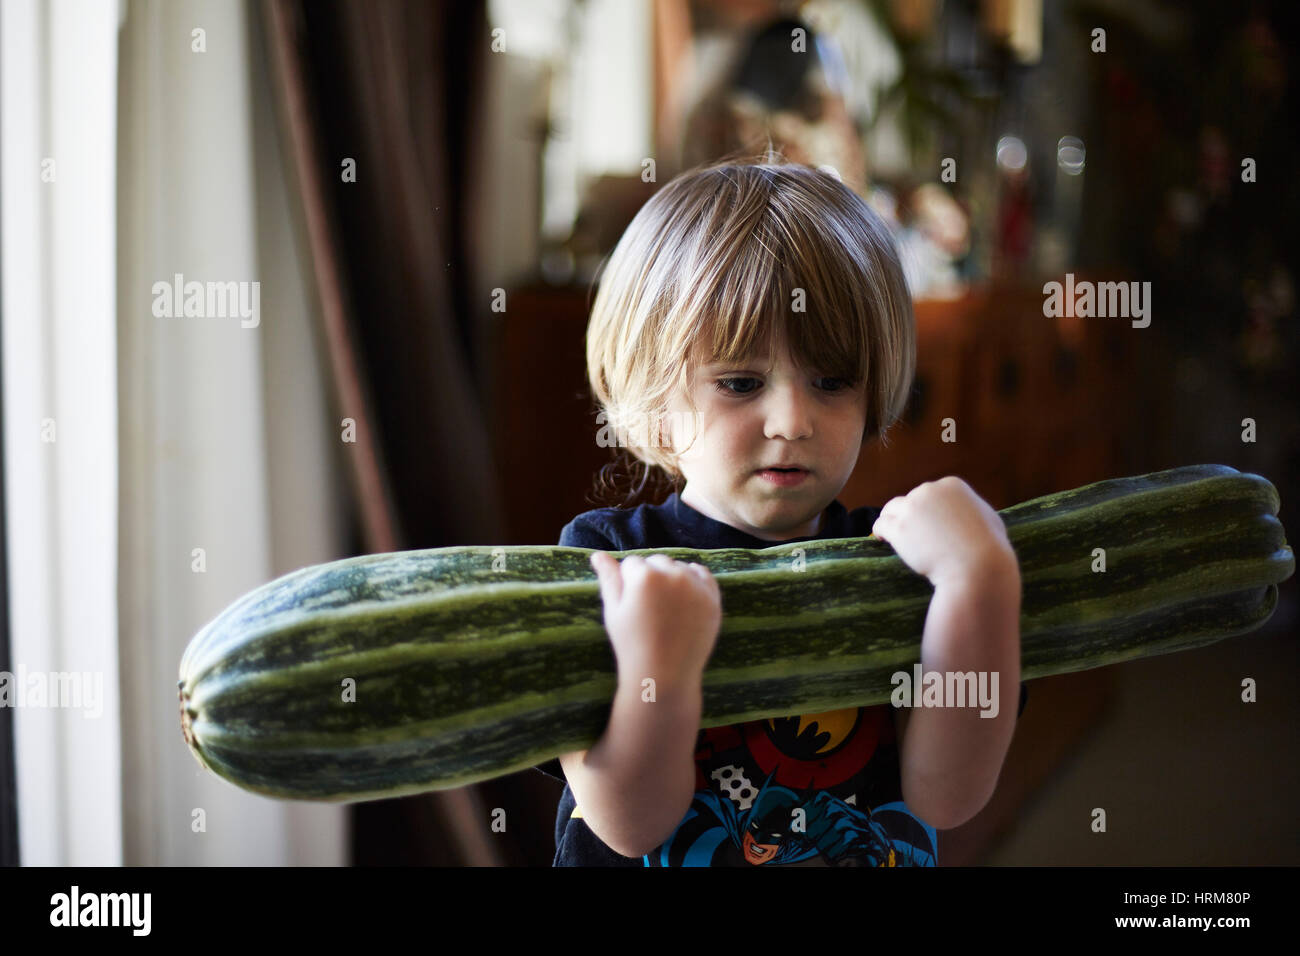 Joven con gran calabacín Imagen De Stock